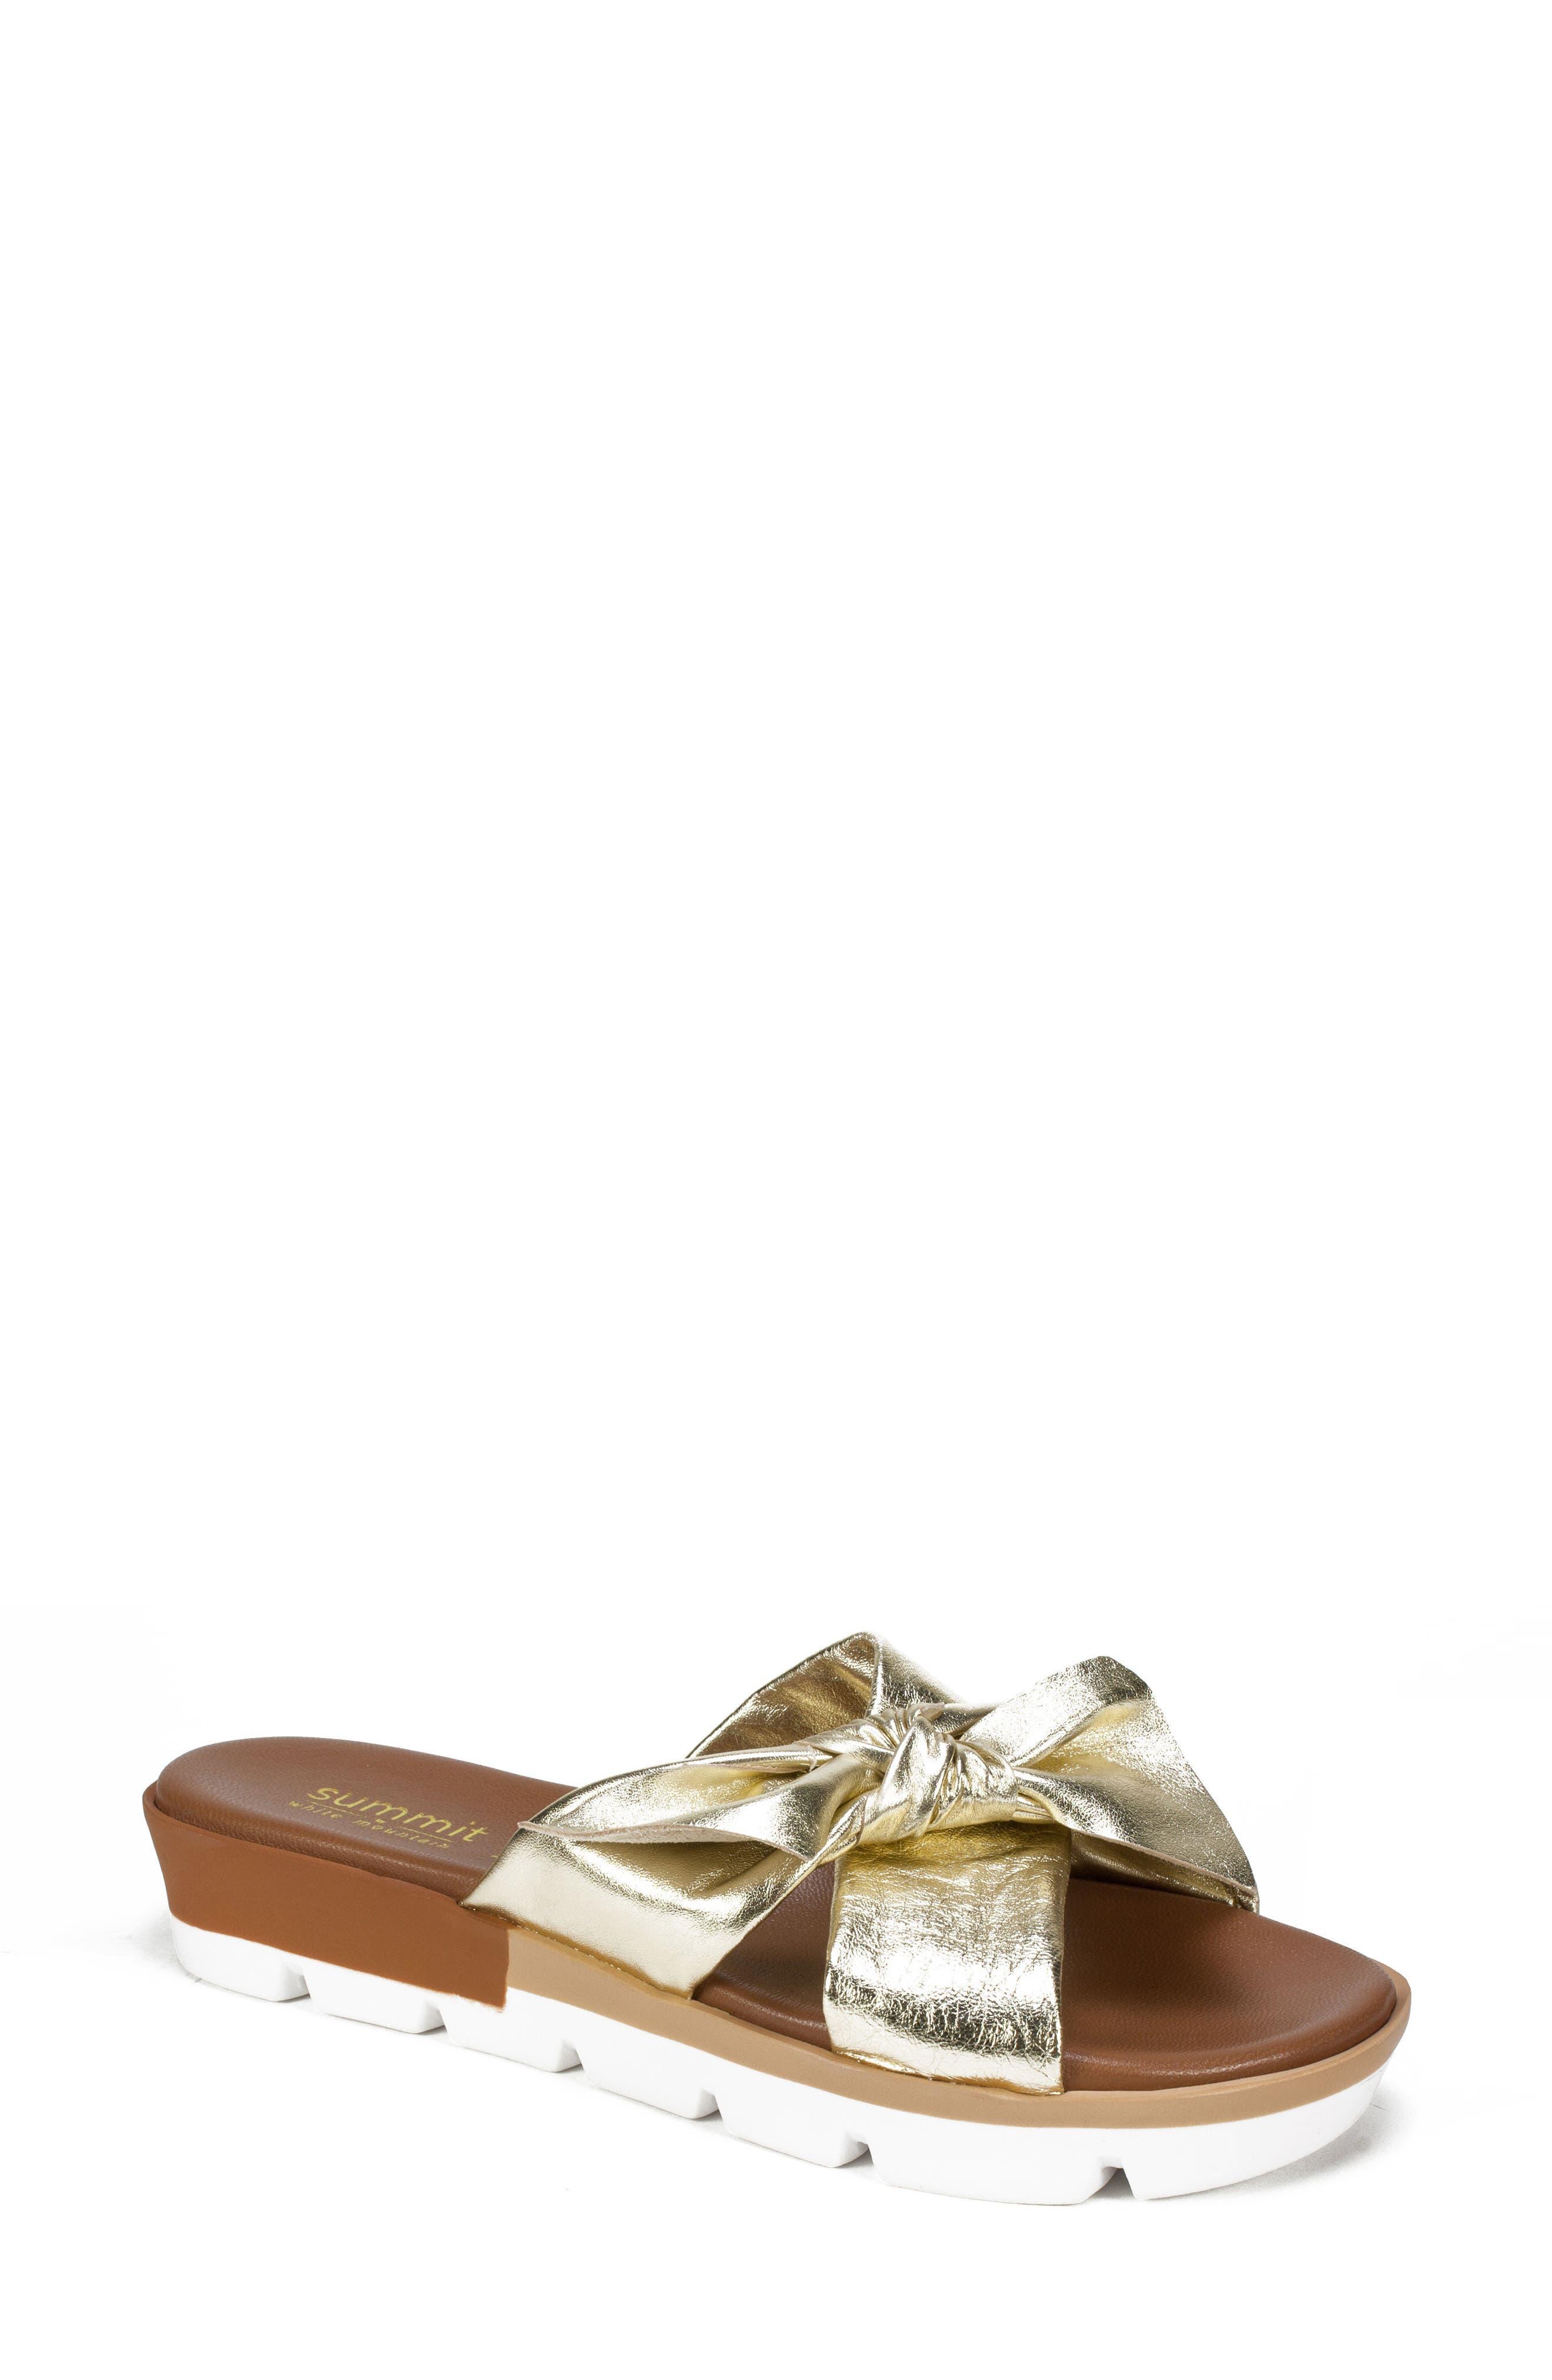 Fynn Slide Sandal,                             Main thumbnail 1, color,                             Platinum Leather